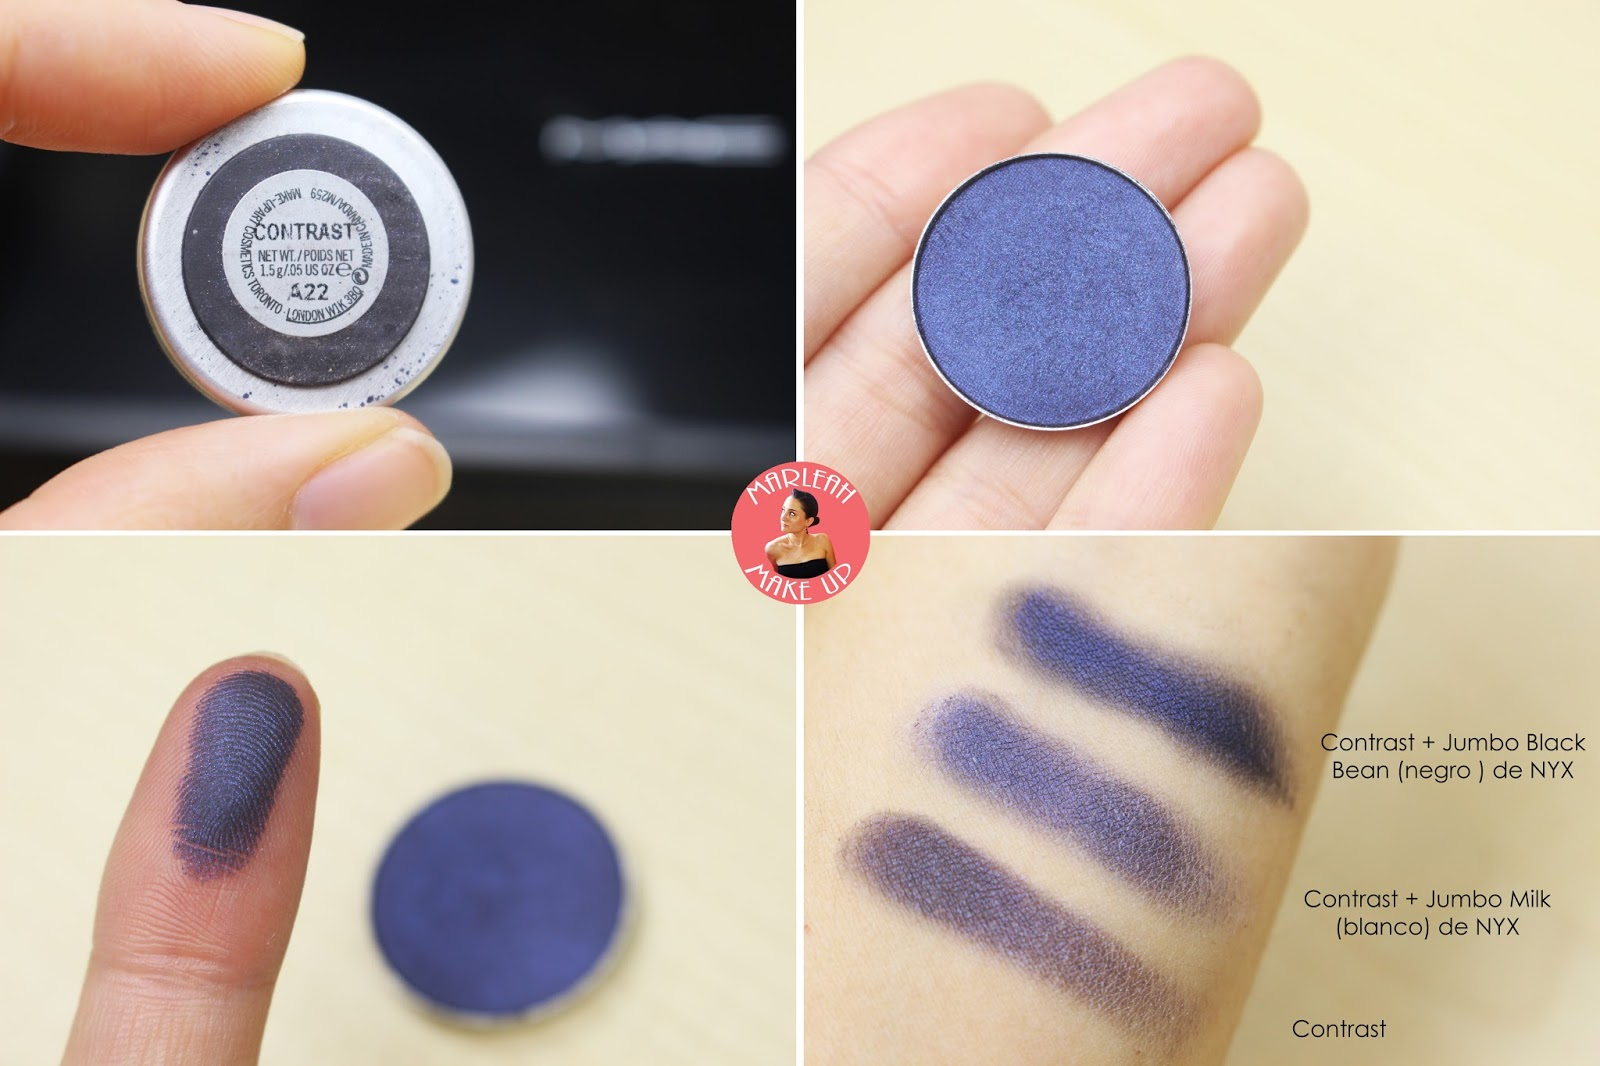 sombras eyeshadow MAC contrast makeup palette godet nyx milk black bean